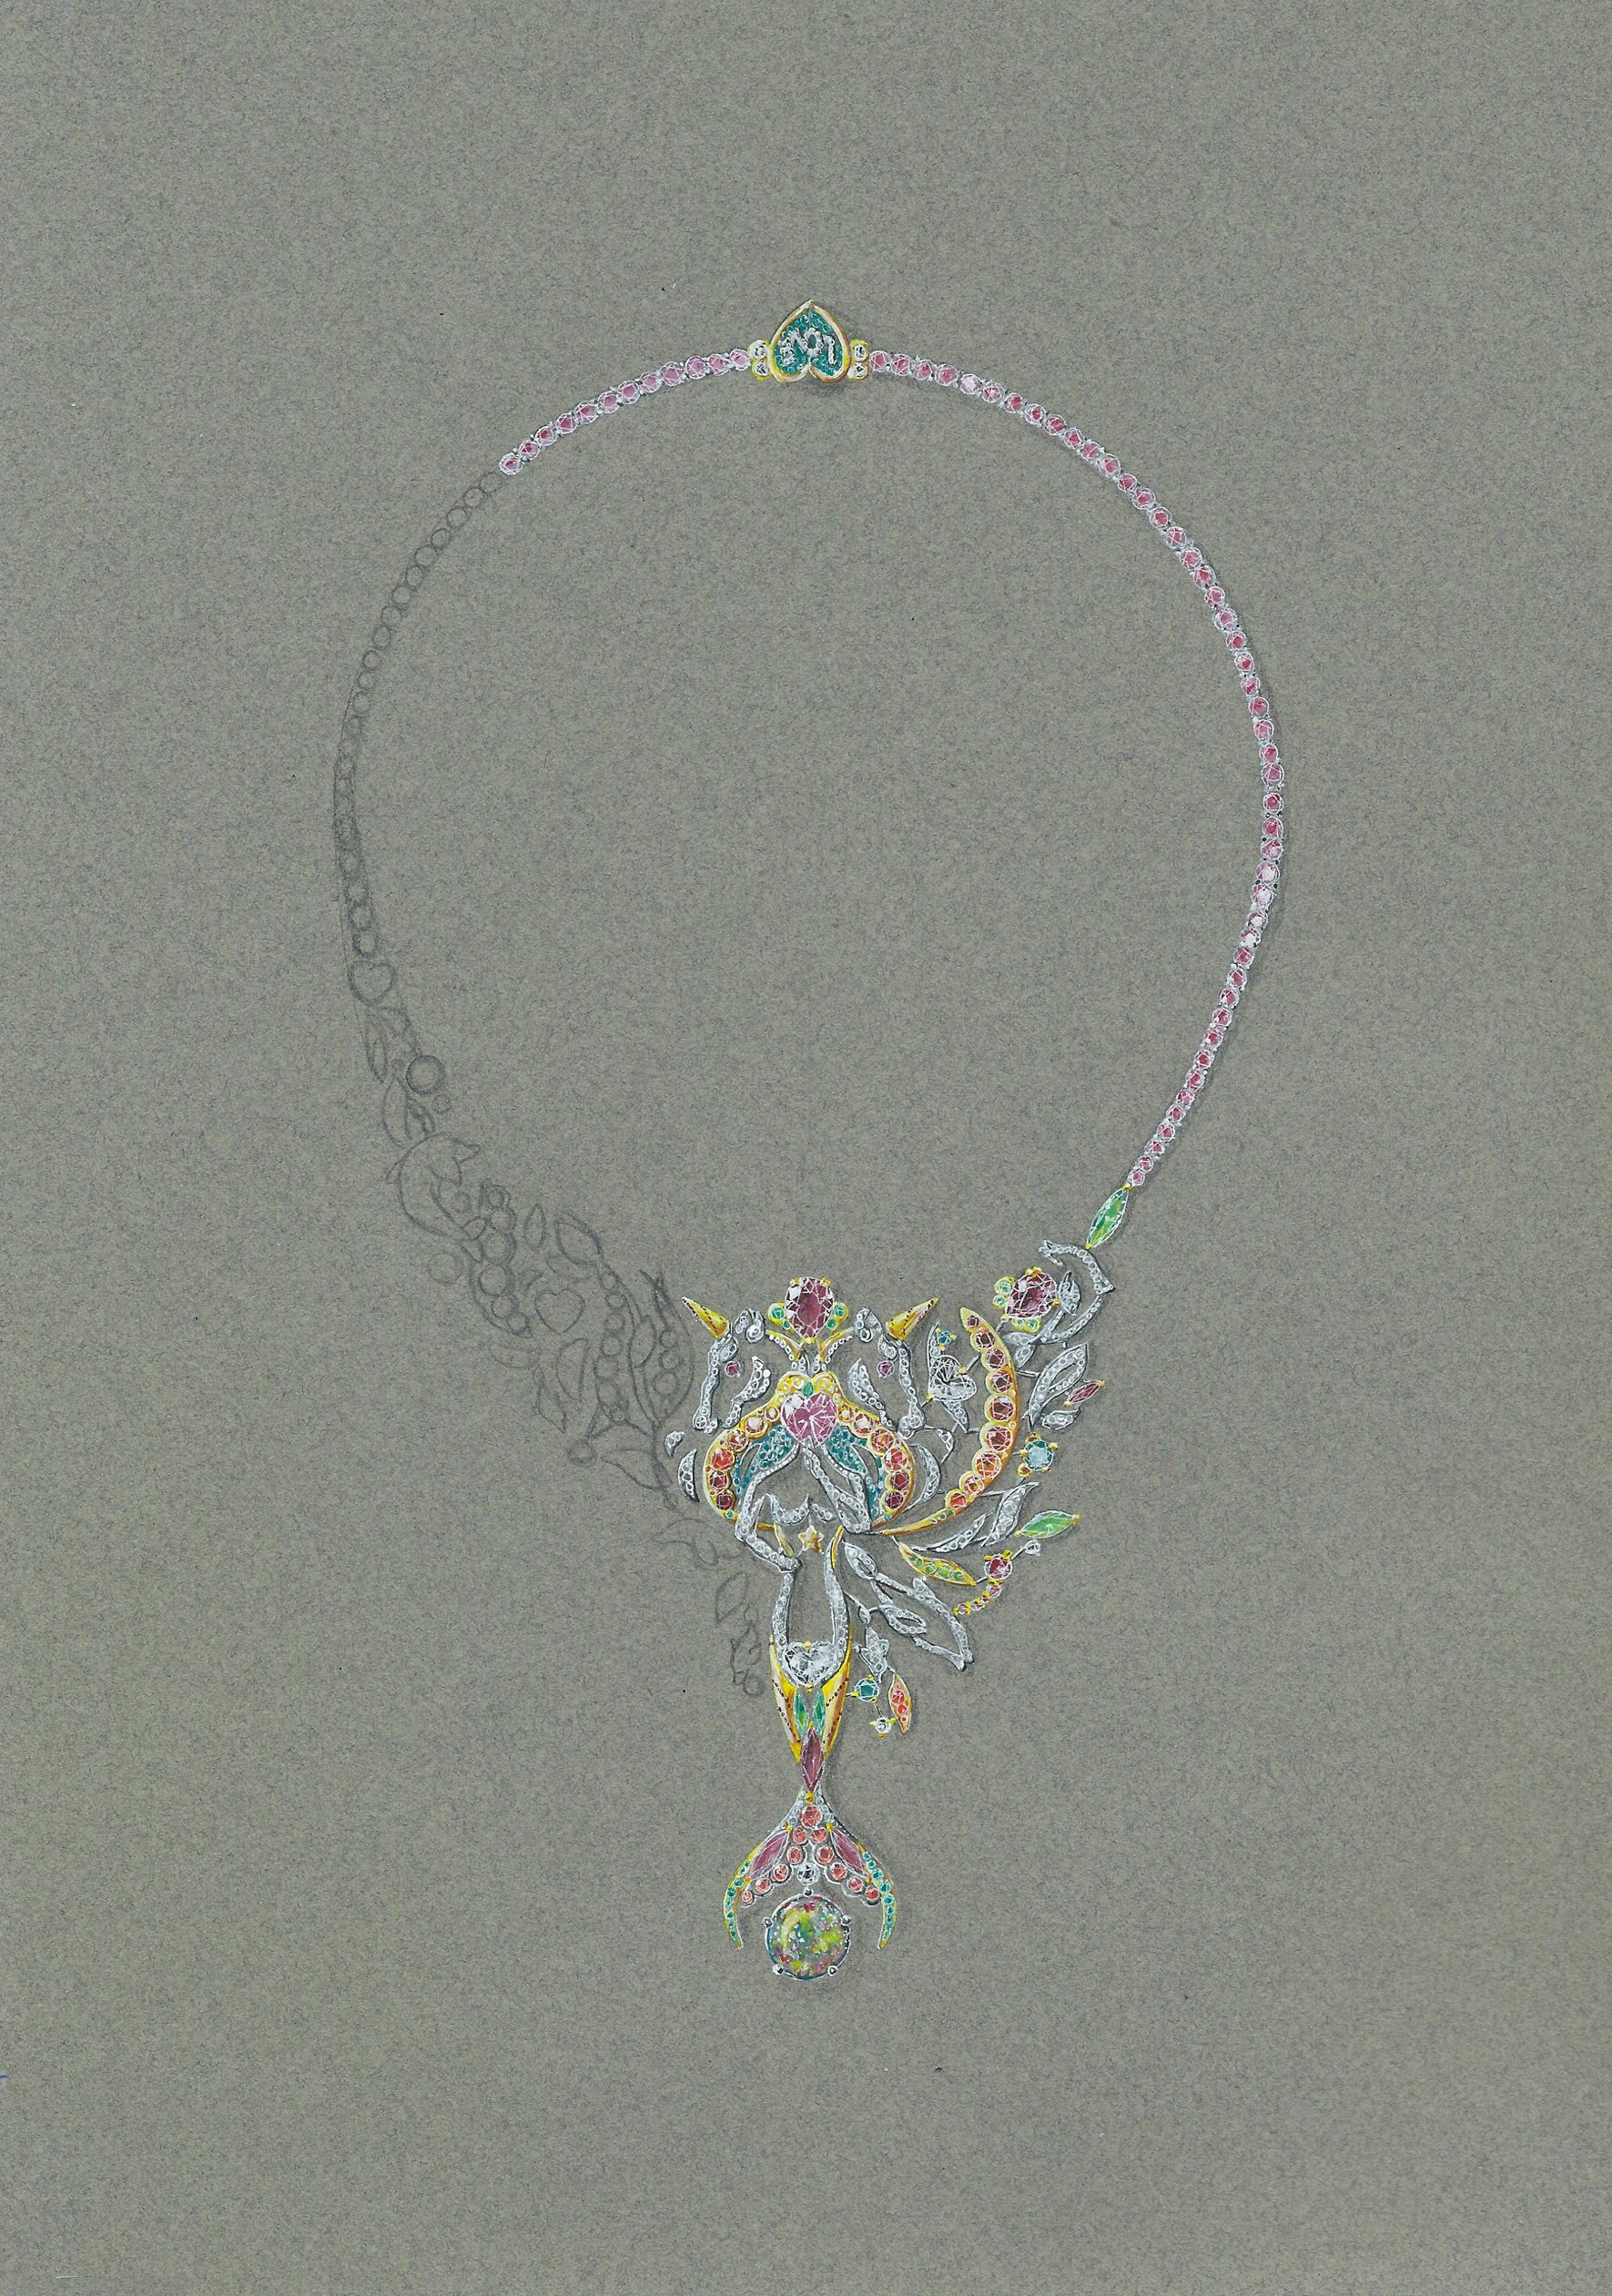 Tony FURION joaillerie gouaché jewellery rendering jewels gouache , collier sirène licorne et dauphin, necklance mermaid, unicorn and dolphin